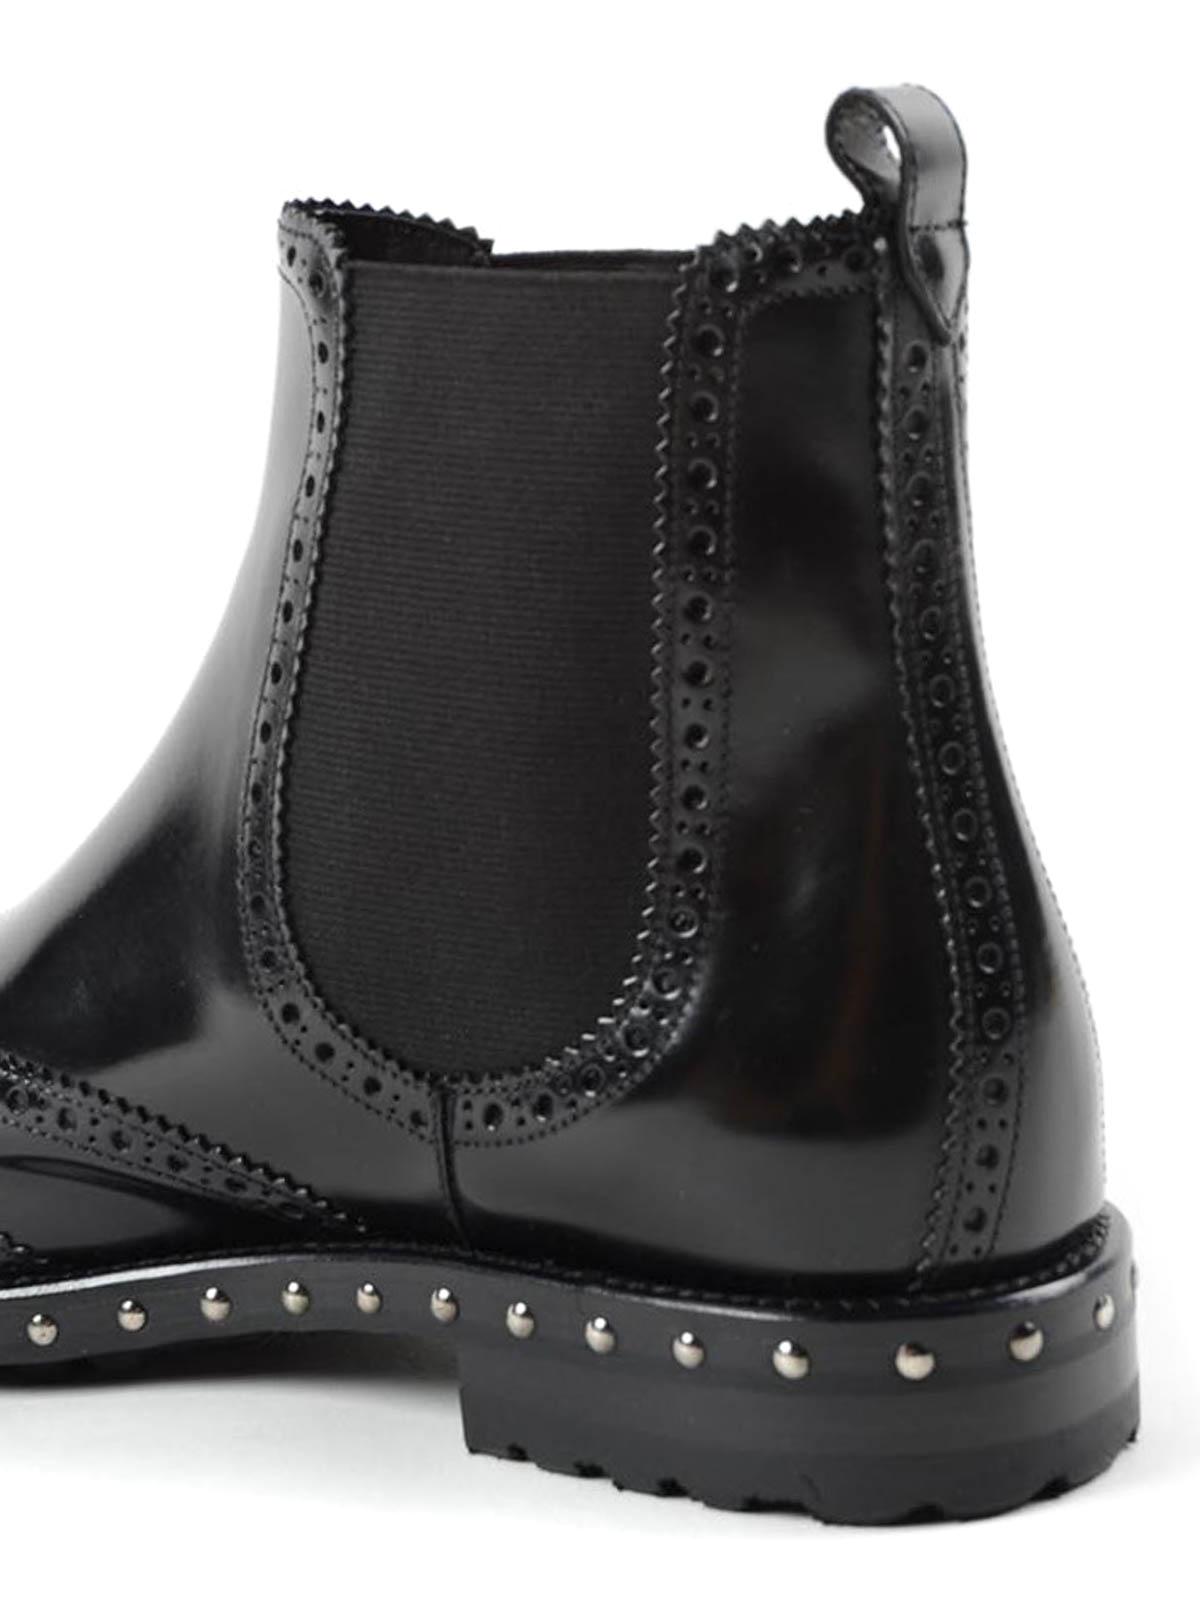 Stud detail brogue chelsea boots